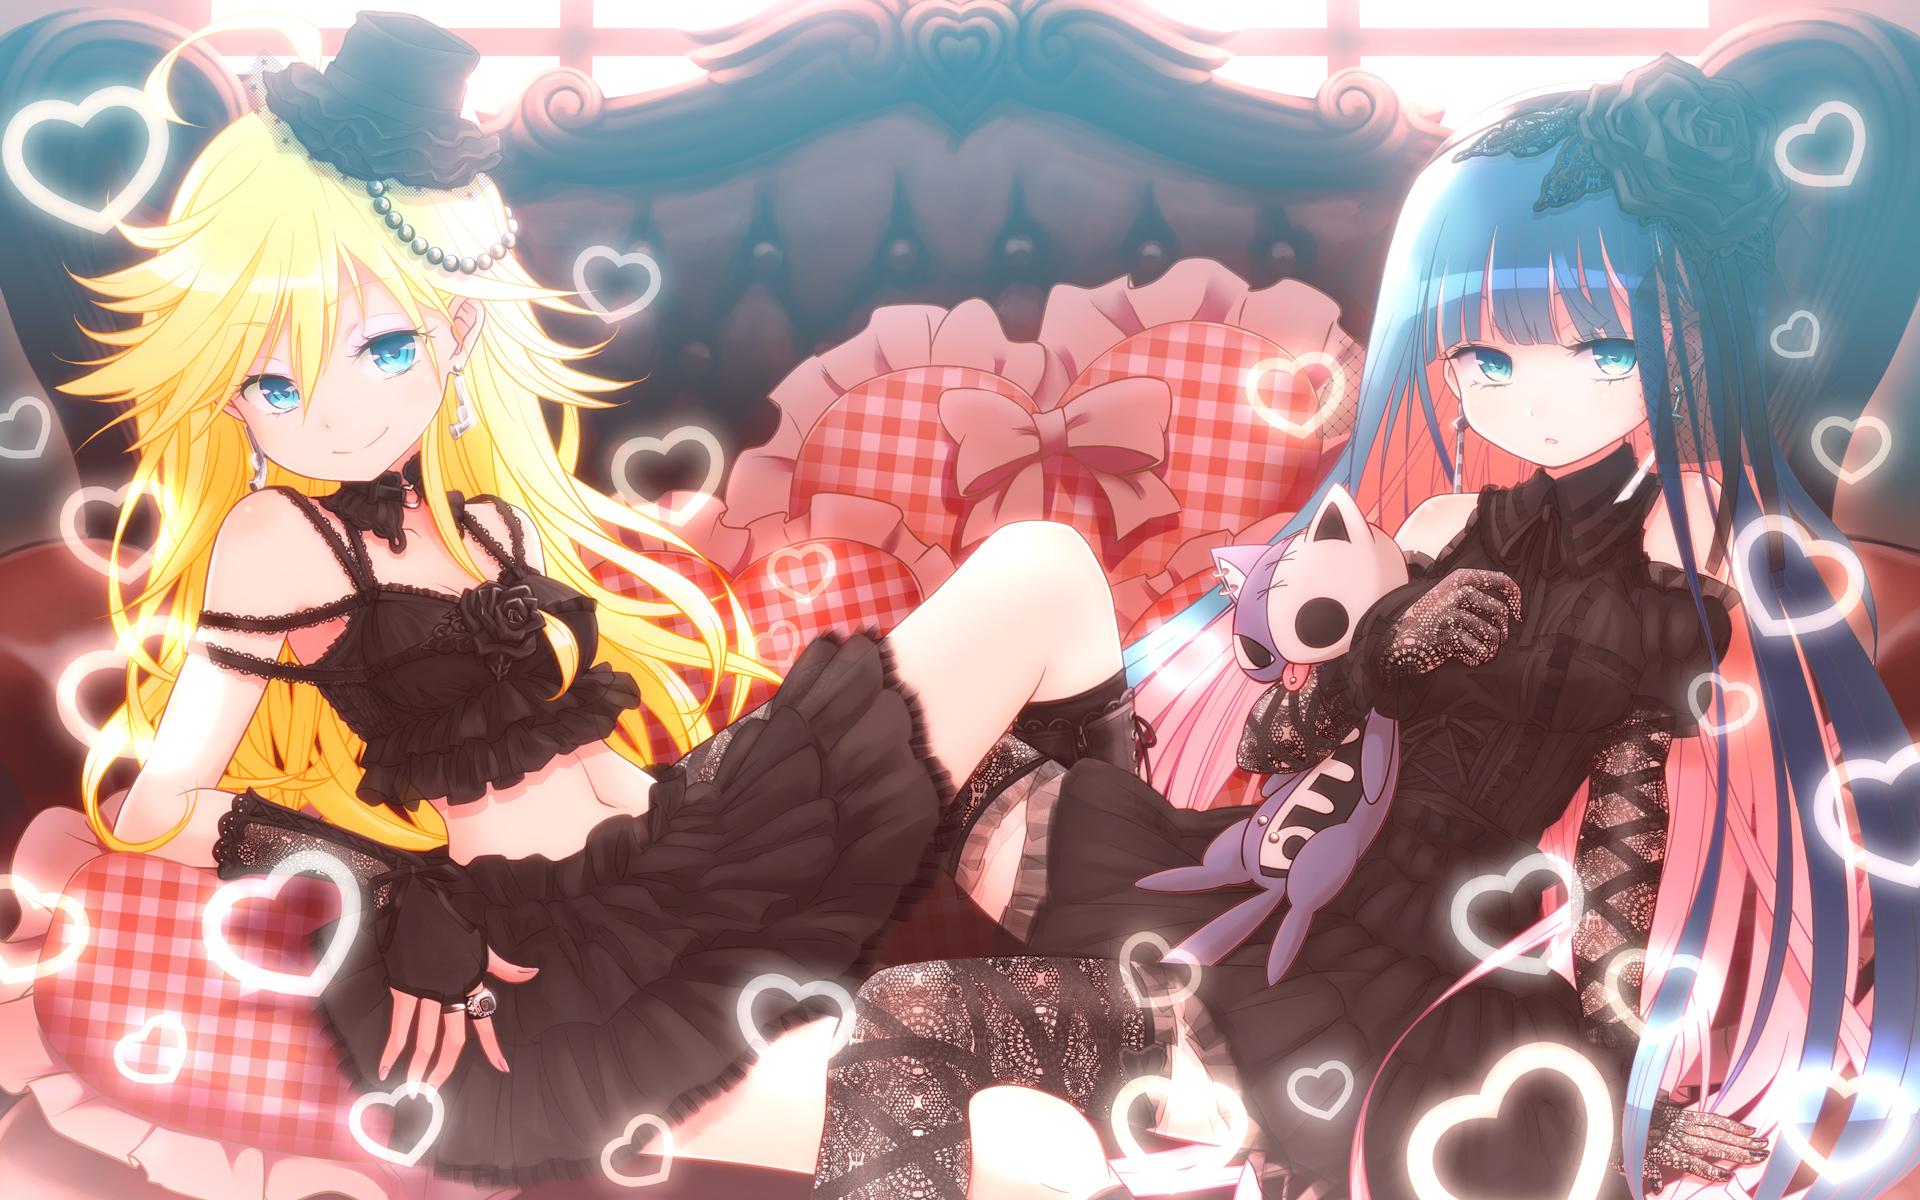 kuinji_51go panty_&_stocking_with_garterbelt panty_(character) stocking_(character)